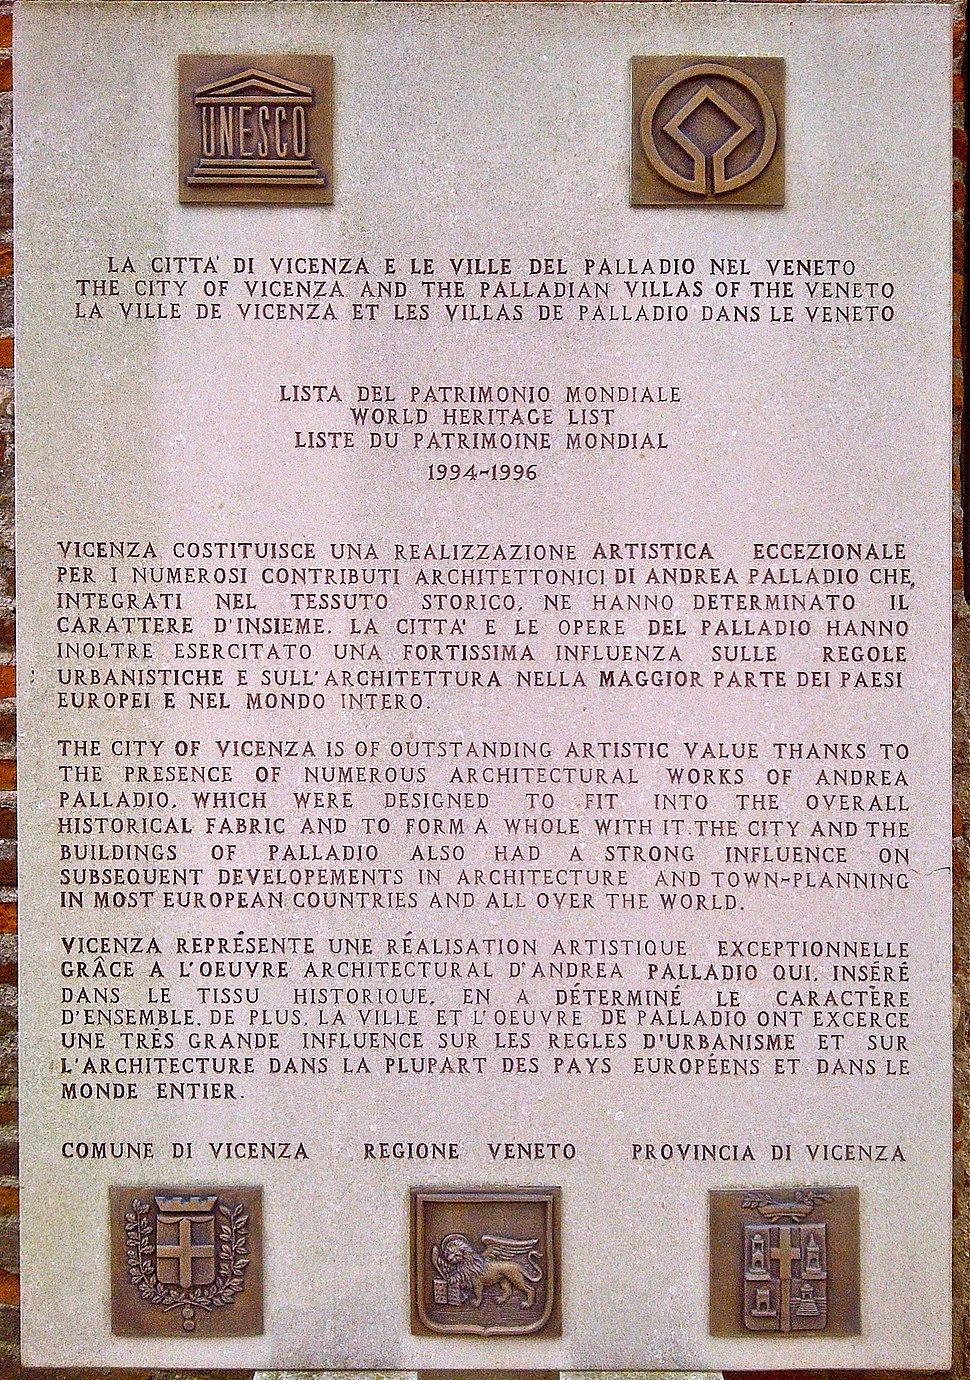 Vicenza, World Heritage List